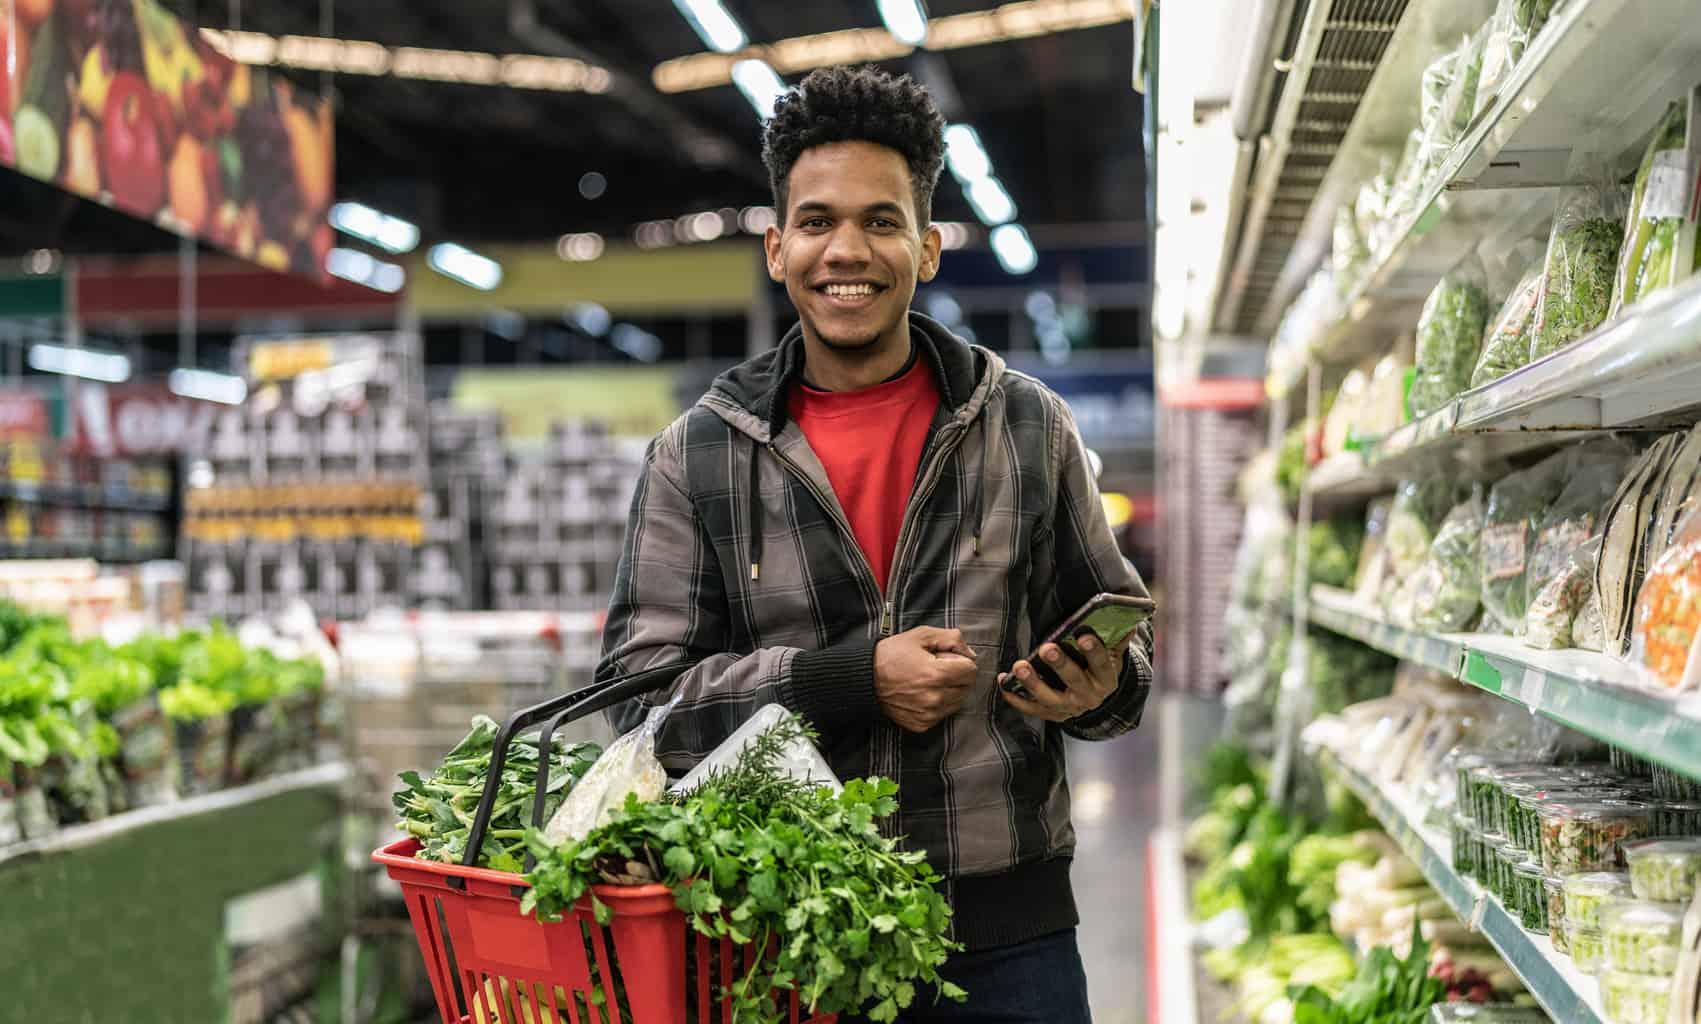 hispanic man in grocery store